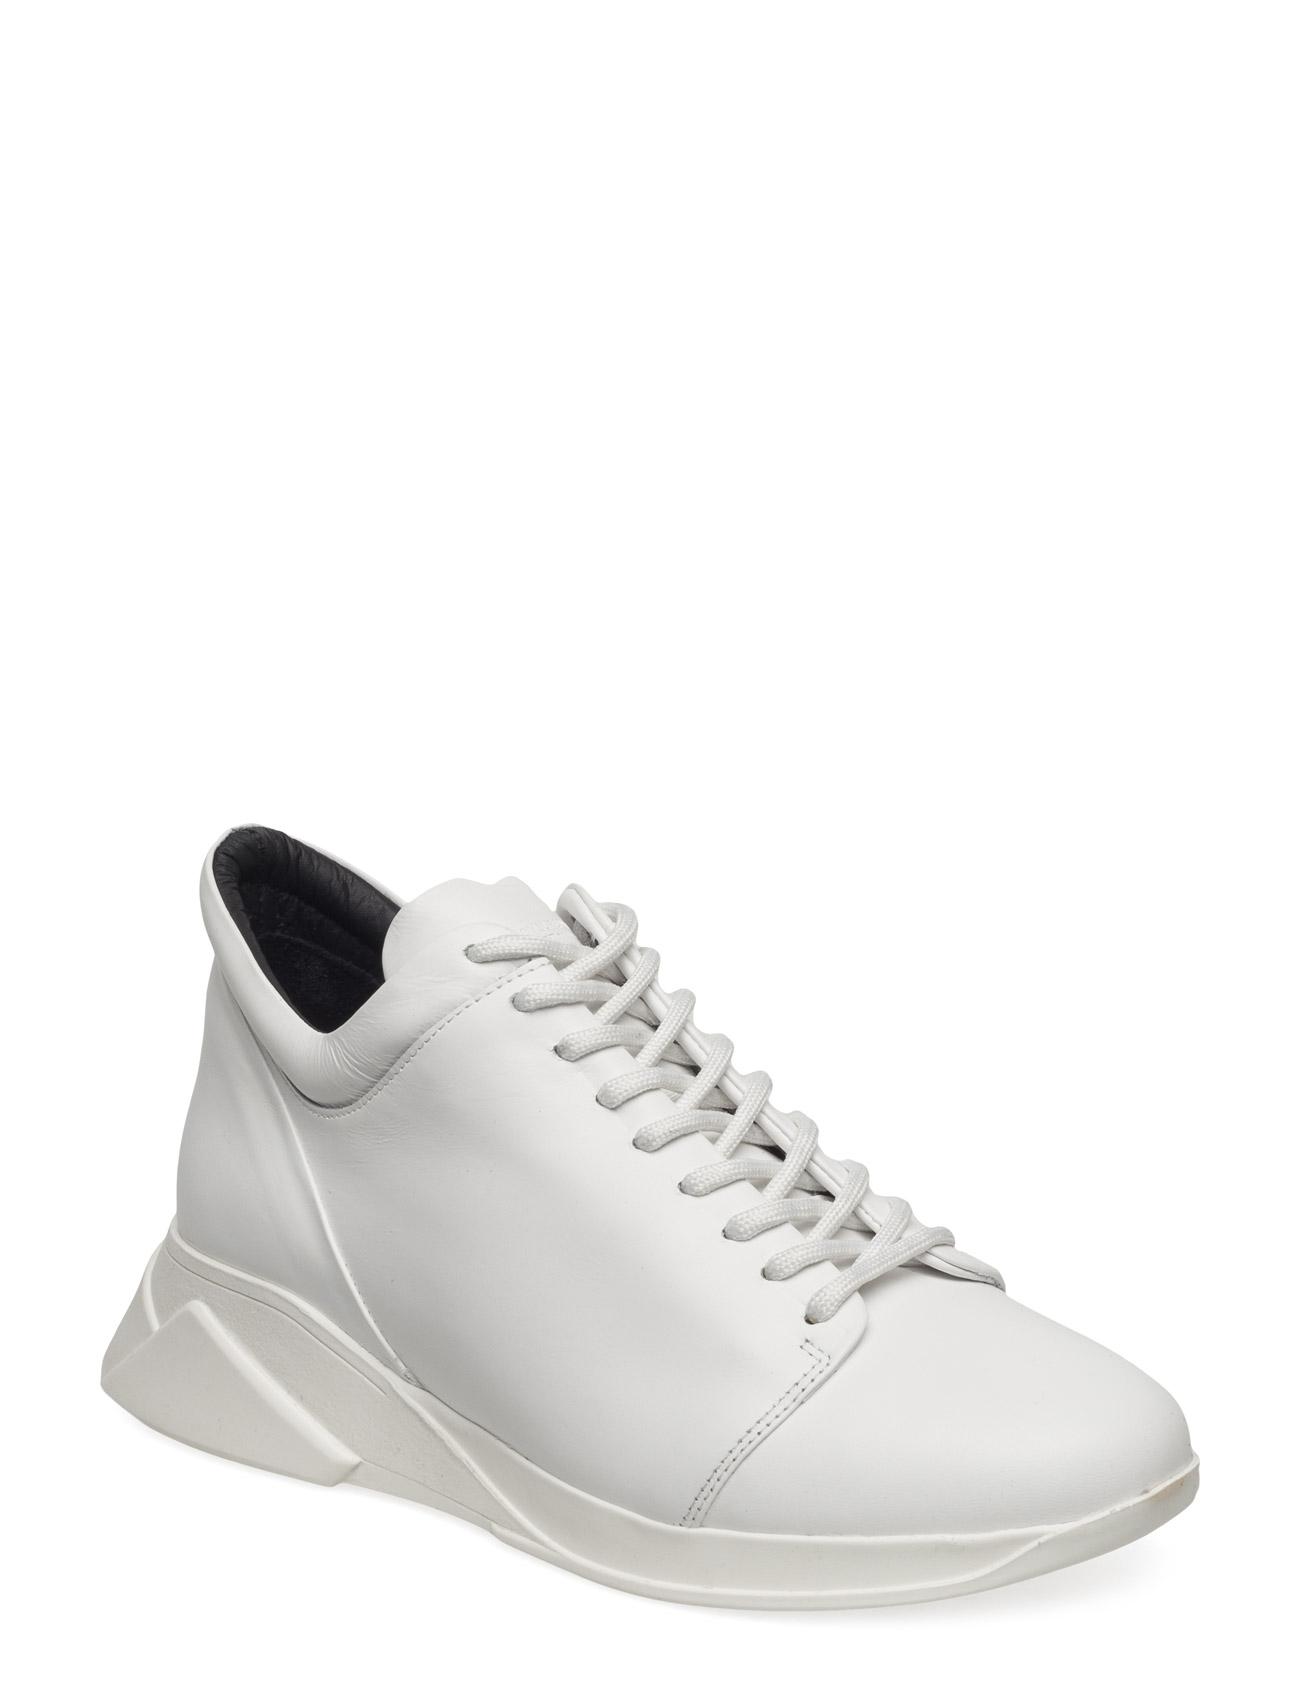 Image of Force Hi Shoe Wmn High-top Sneakers Hvid ROYAL REPUBLIQ (3040300137)